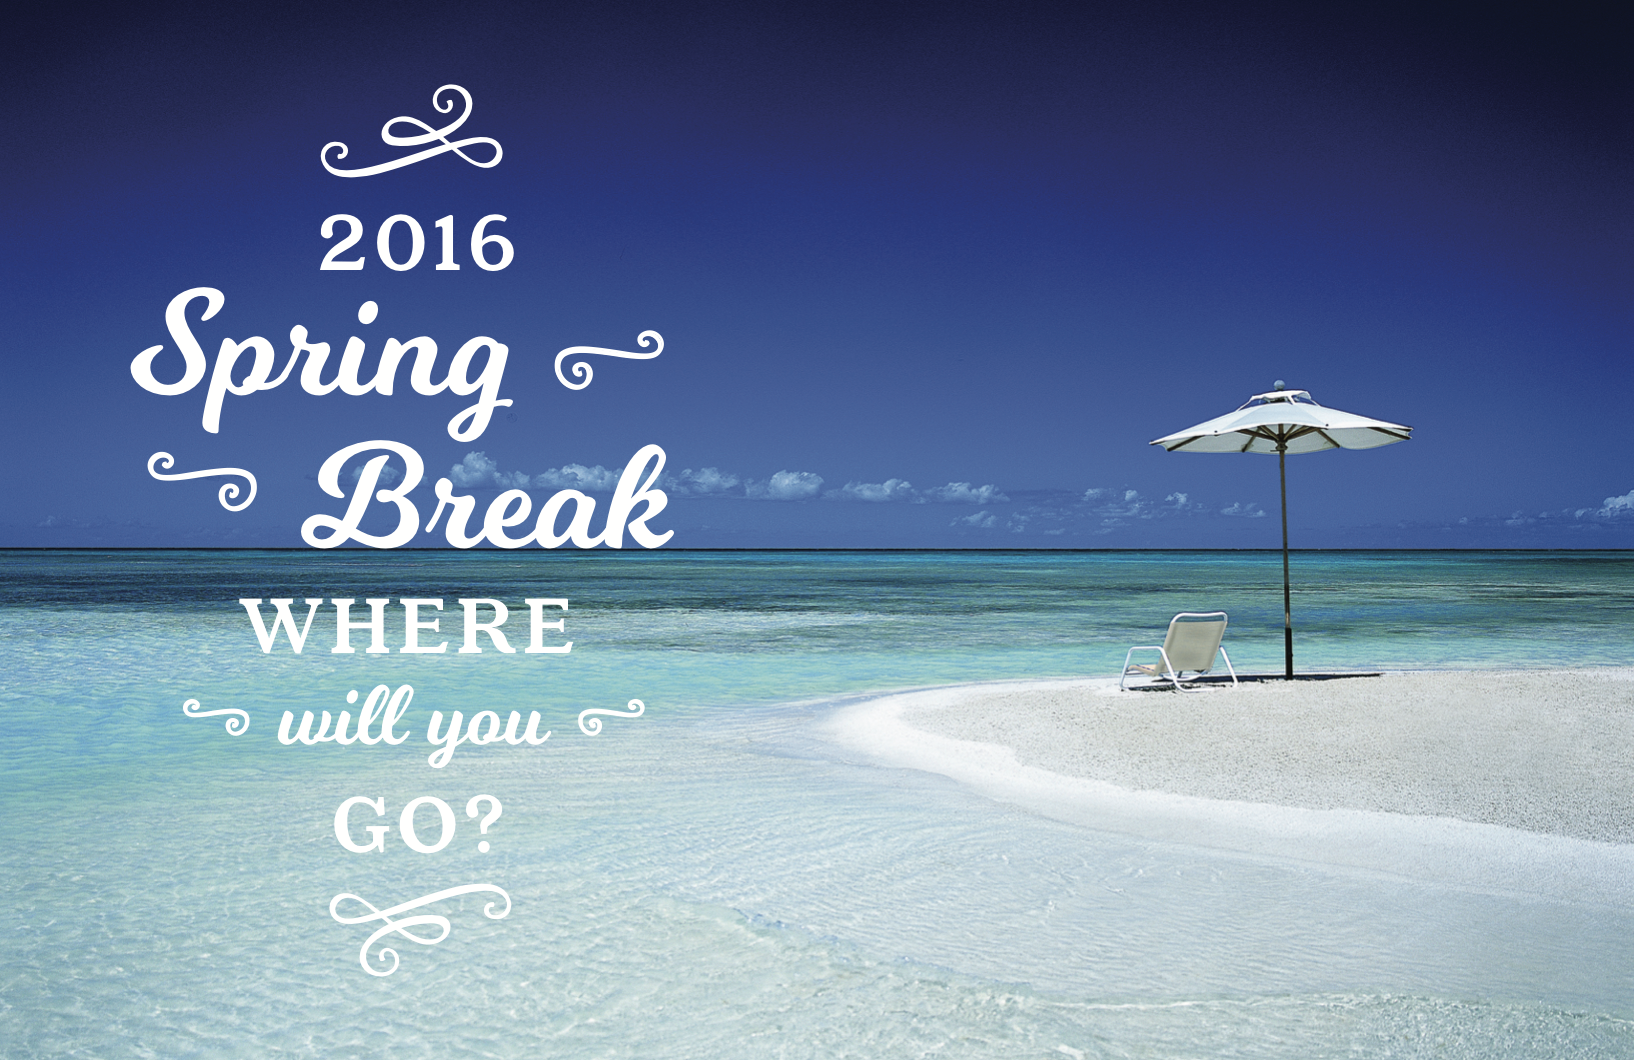 Spring Break 2016 Postcard front